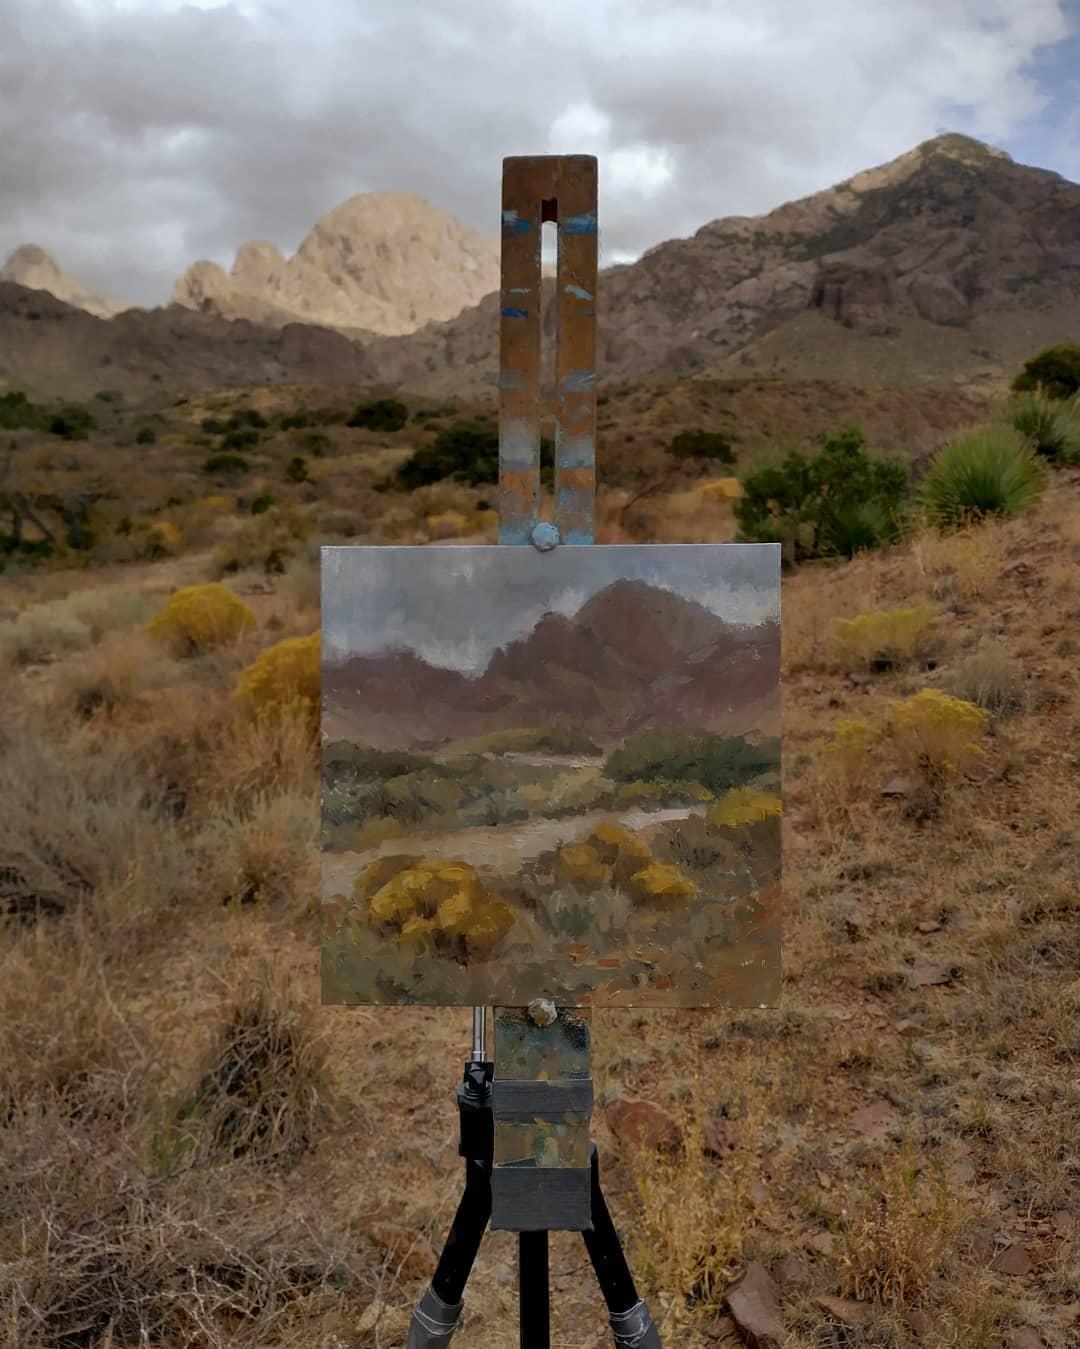 Soledad Canyon painting